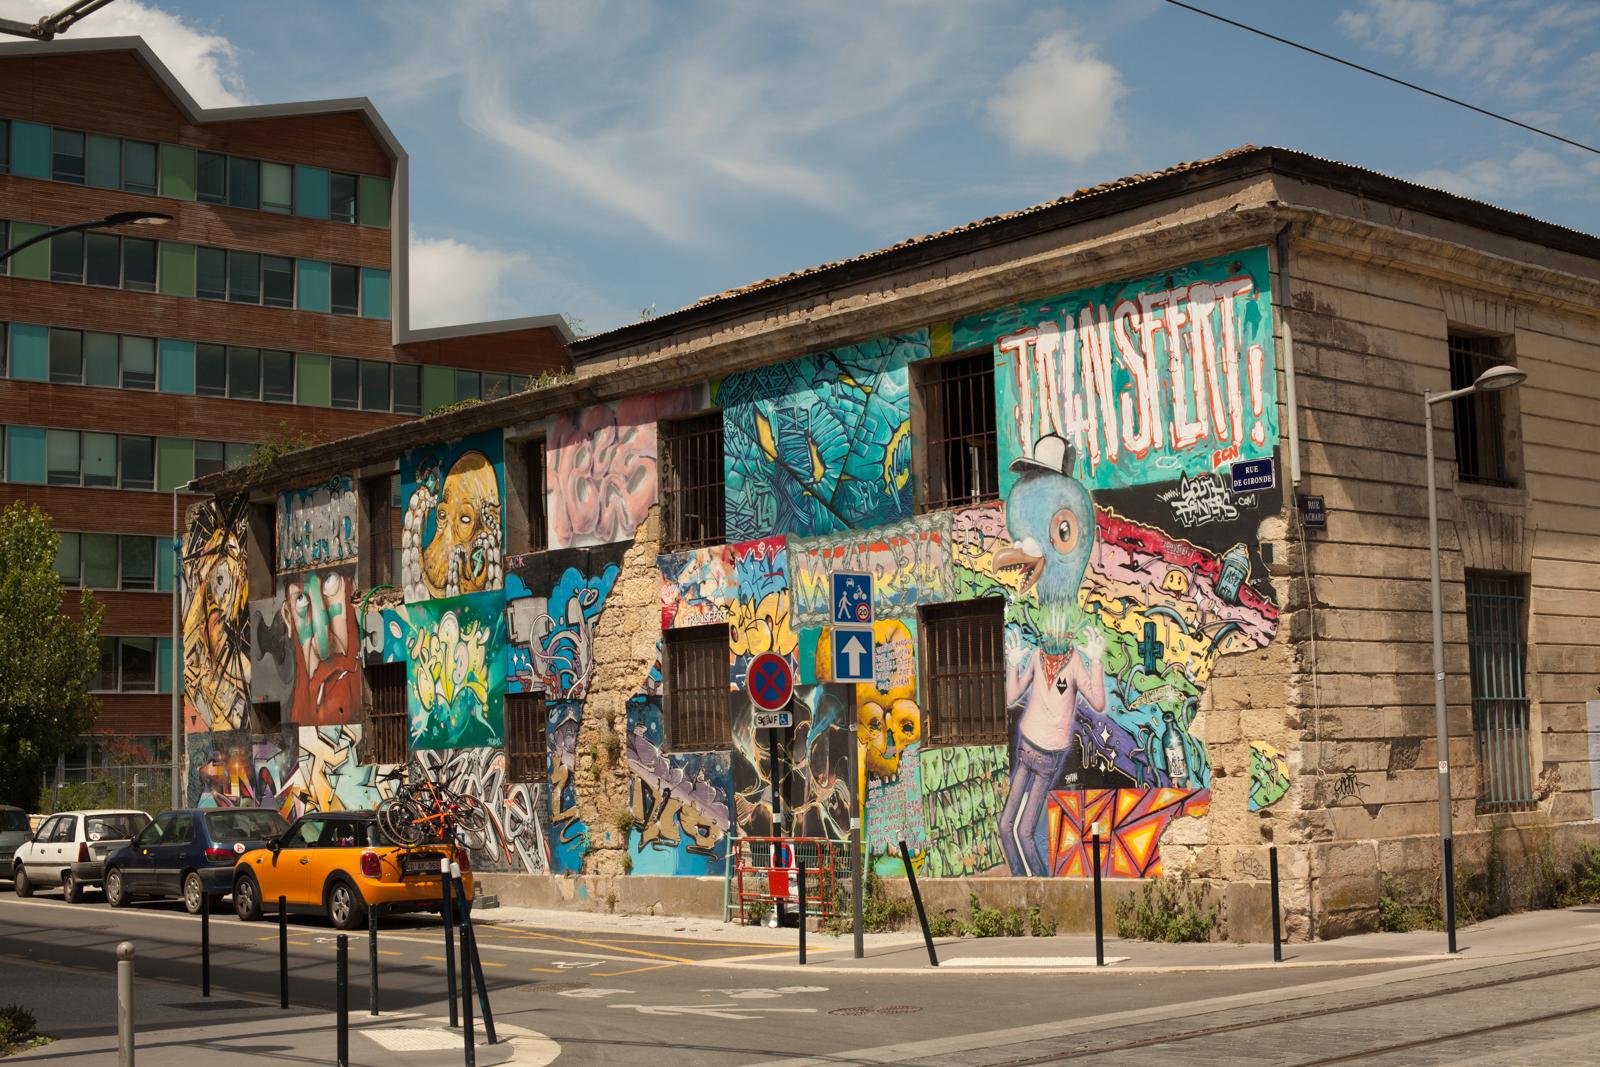 bassins à flots bordeaux, bassins à flots, bassins à flots street art, street art bordeaux, les vivres de l'art bordeaux, les vivres de l'art